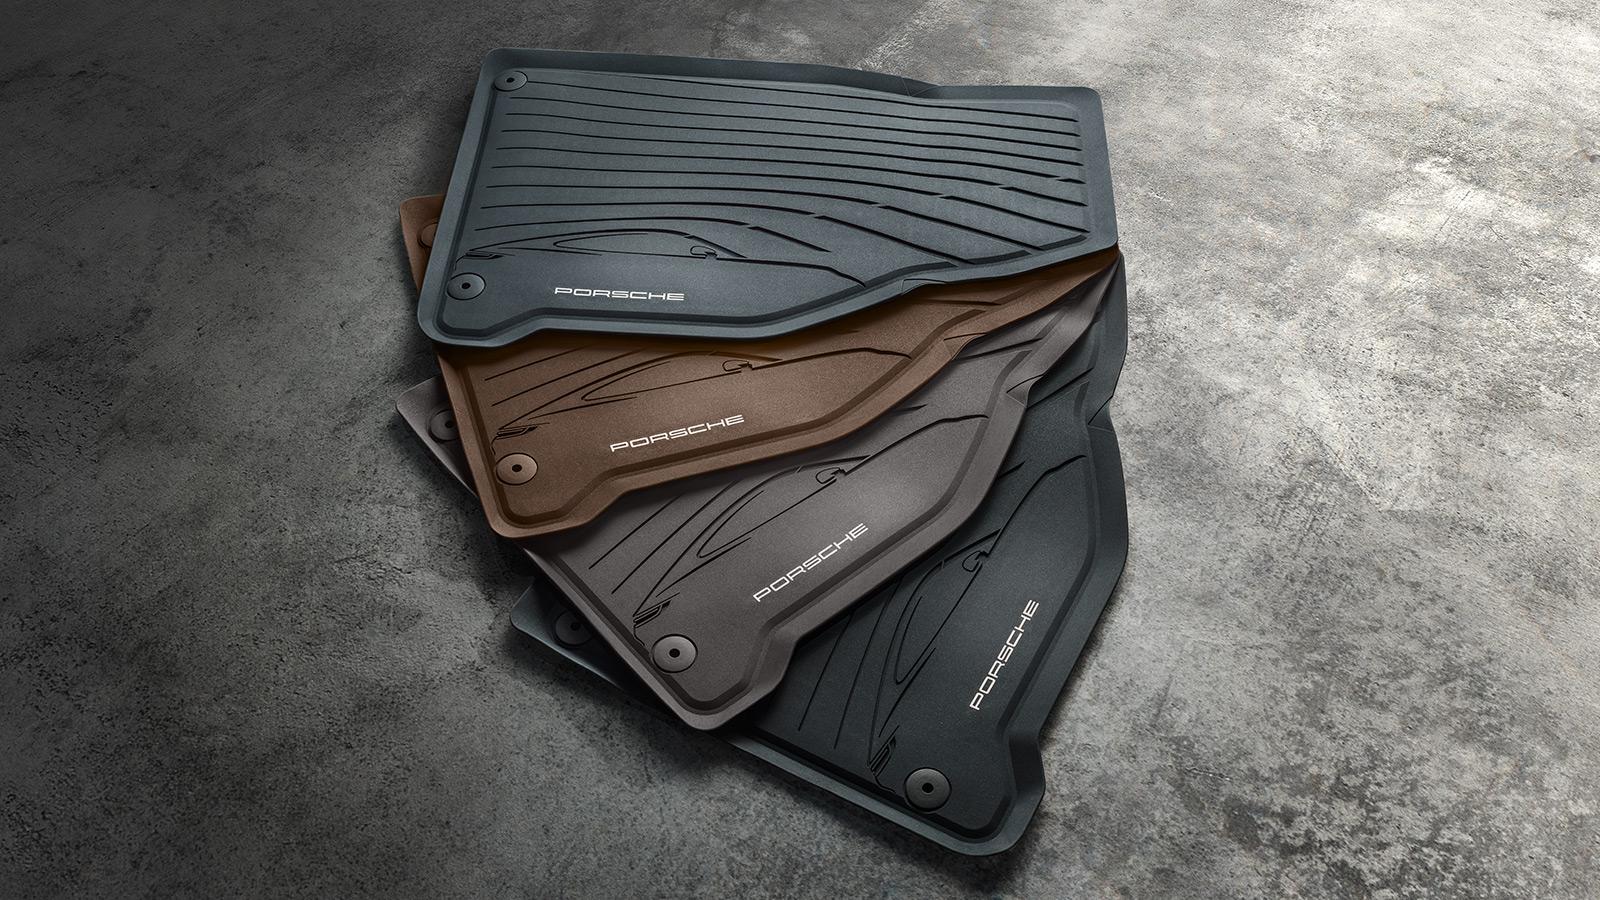 Porsche - Floor mats